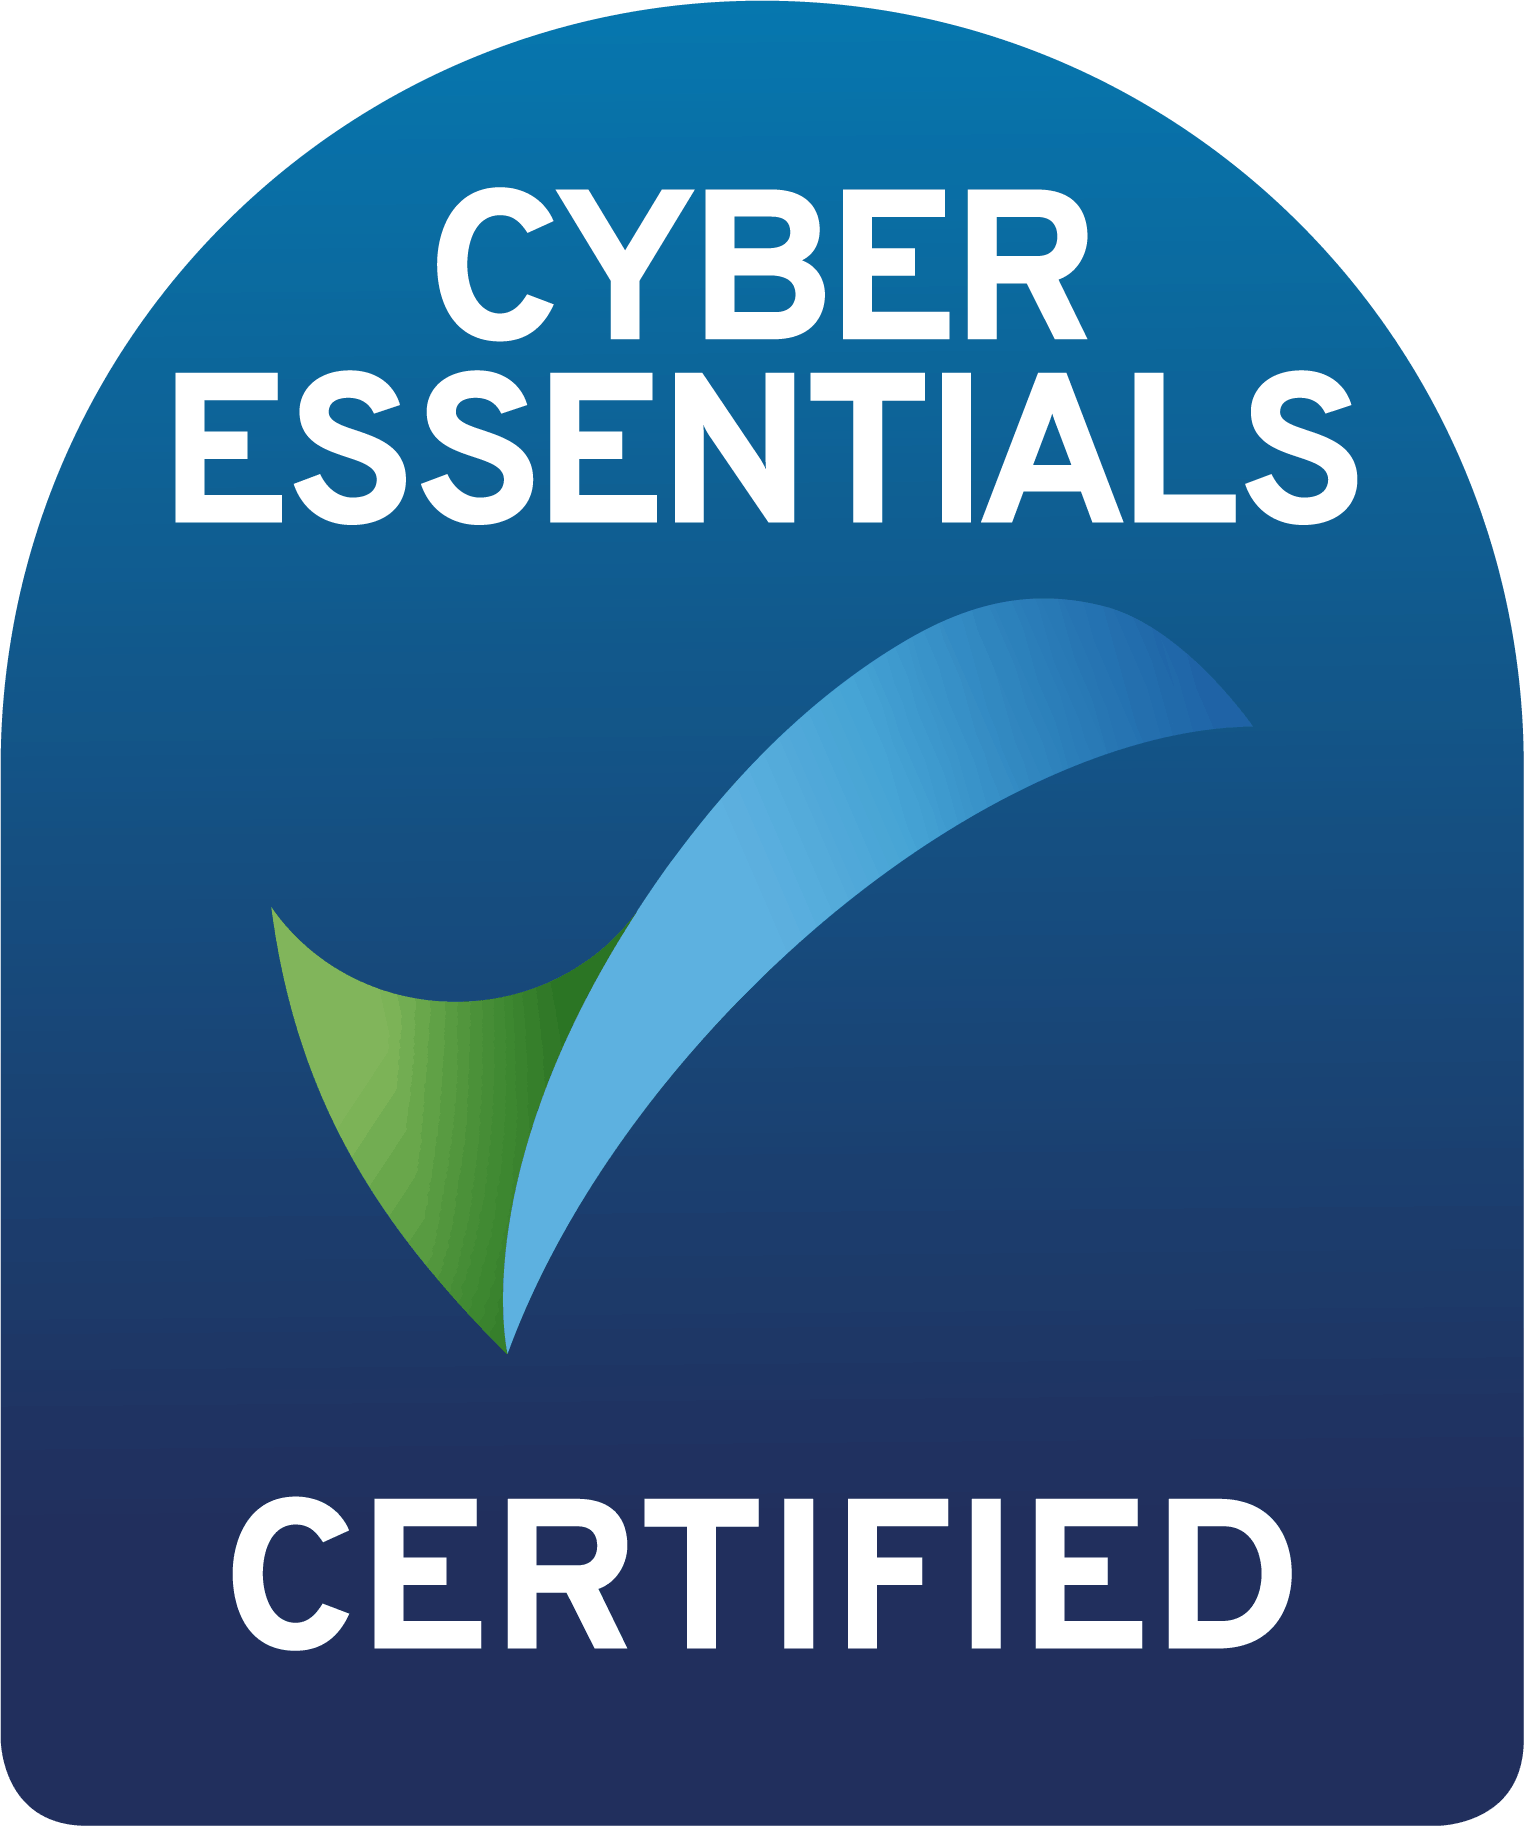 cyberessentials_certification mark_colour_